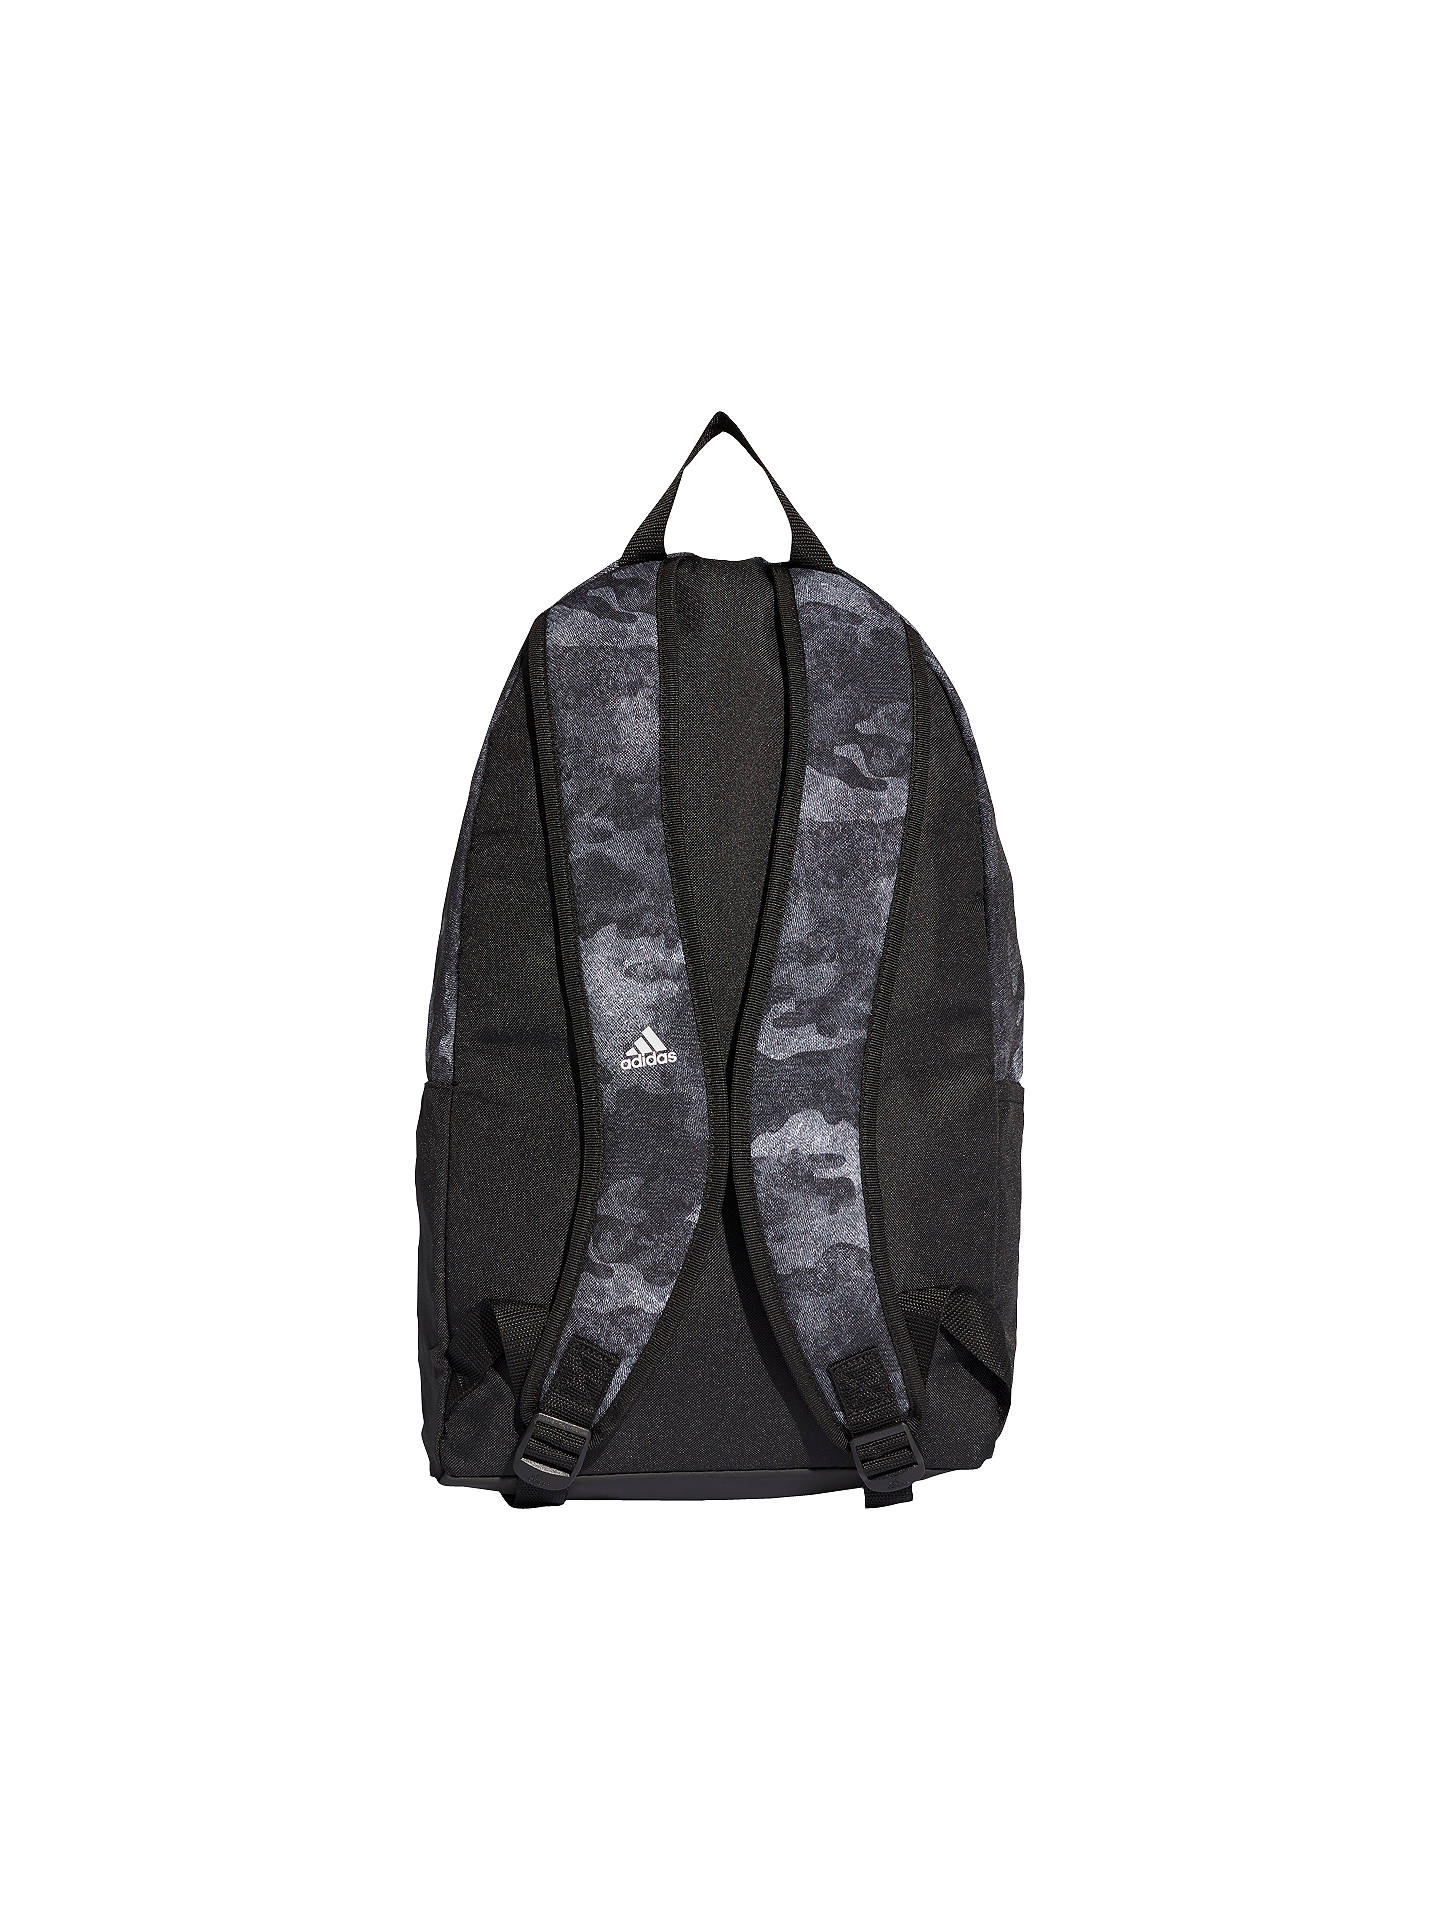 a27a8a3dbec ... Buy adidas Camo Classic Backpack, Black Online at johnlewis.com ...